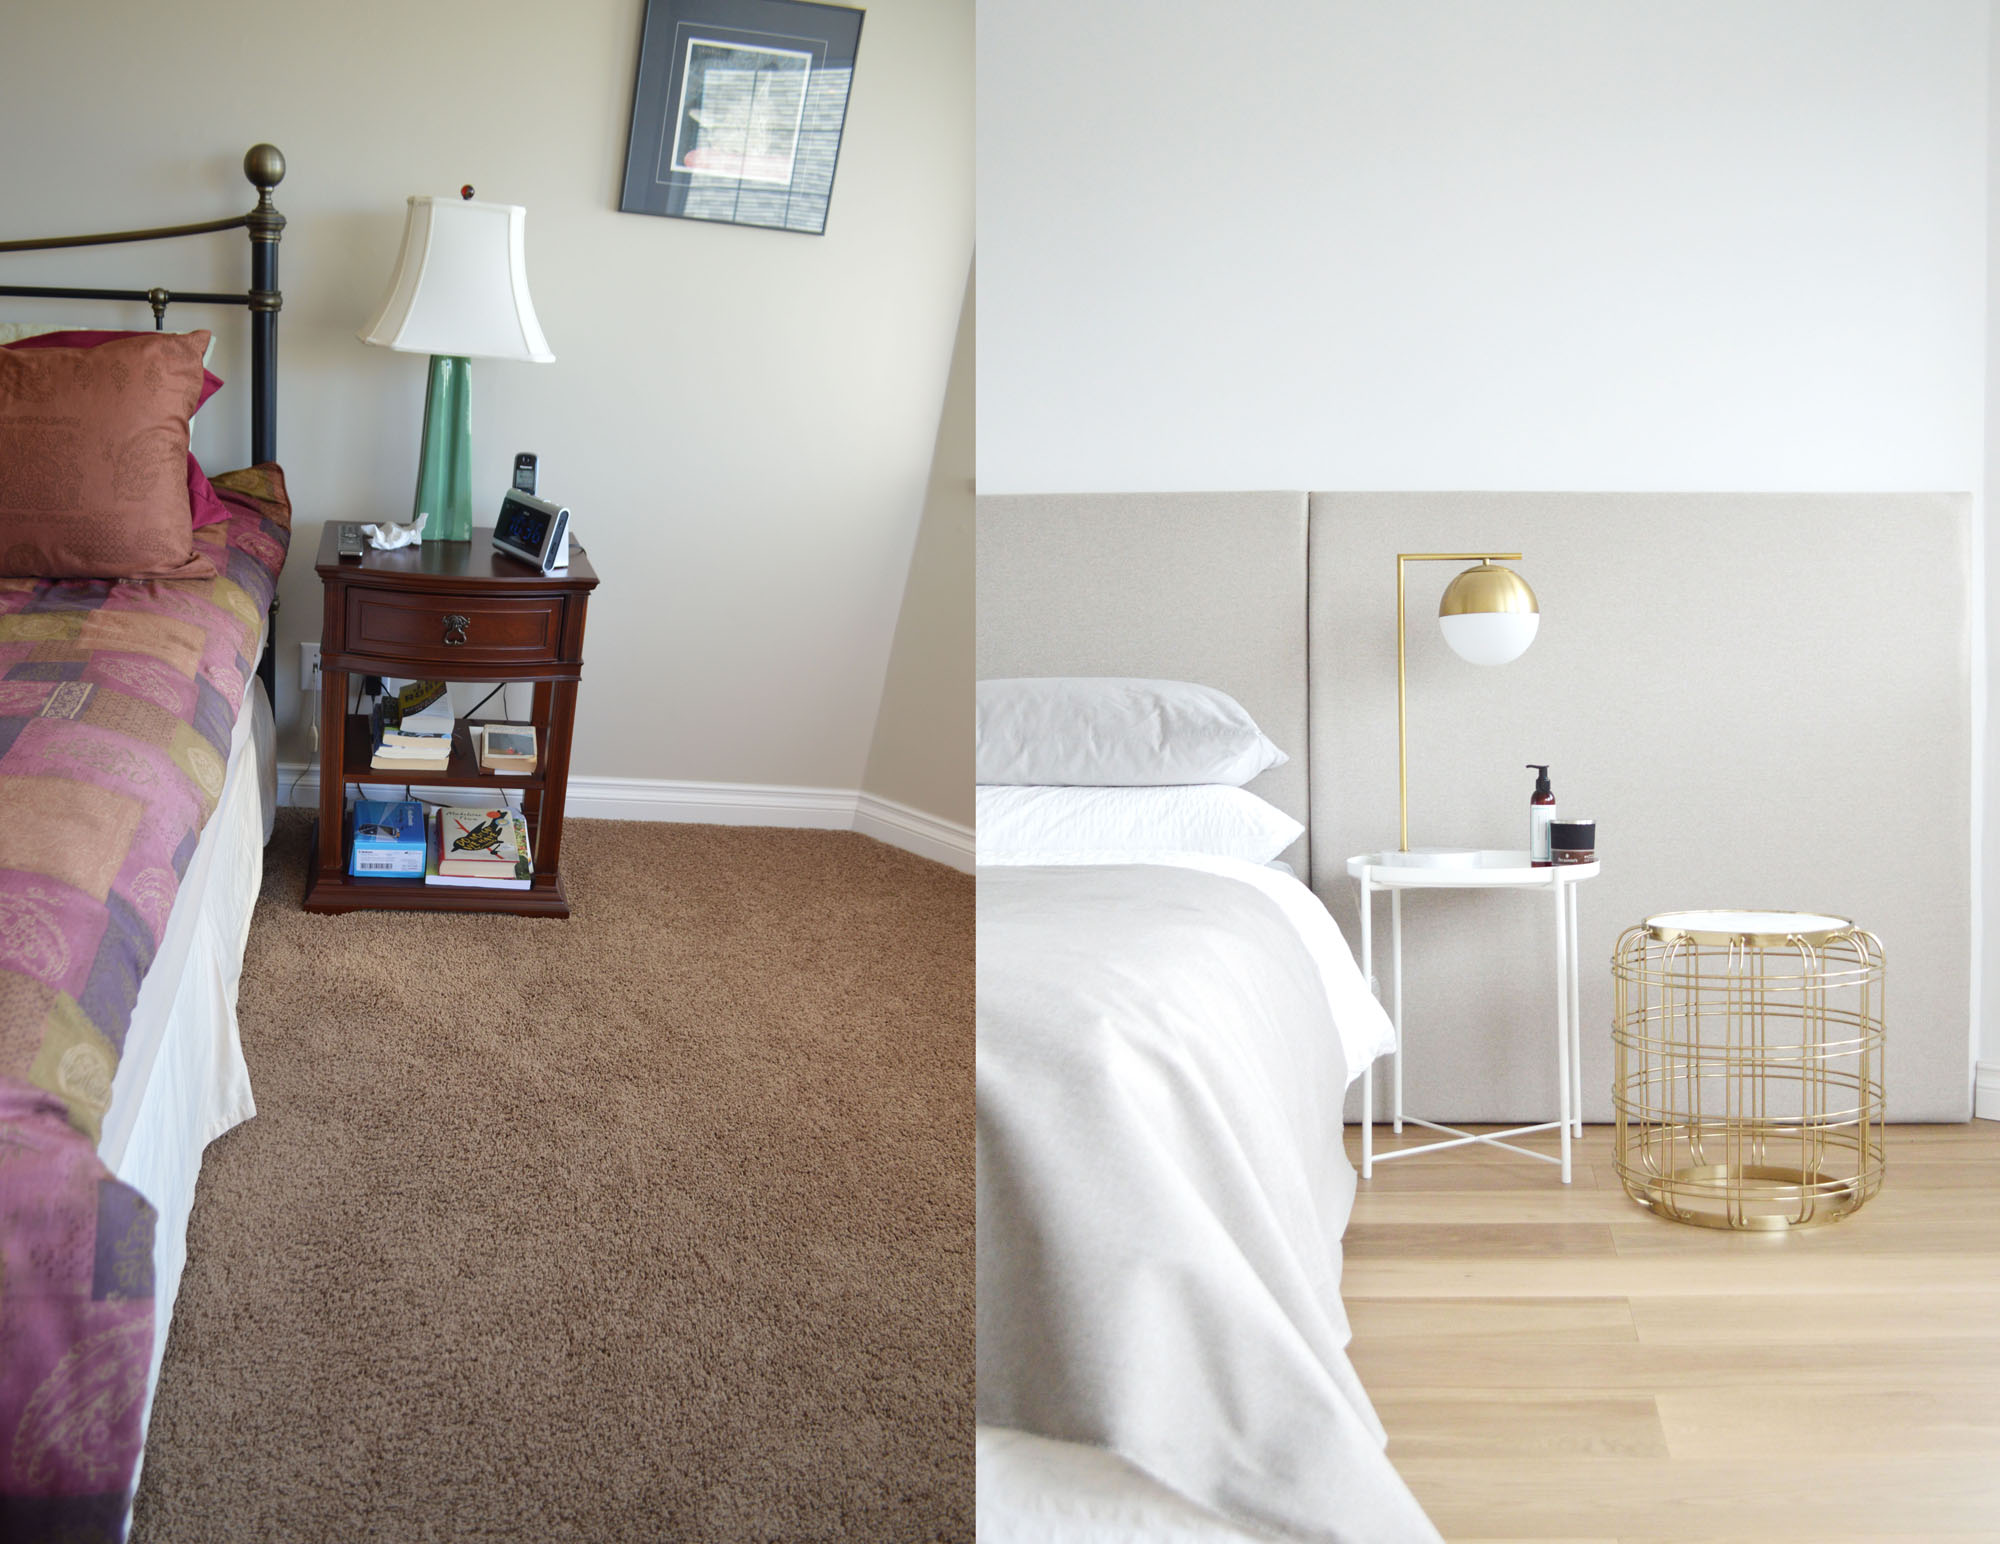 Schlafzimmer Vorher Nachher - Master Bedroom Before & After